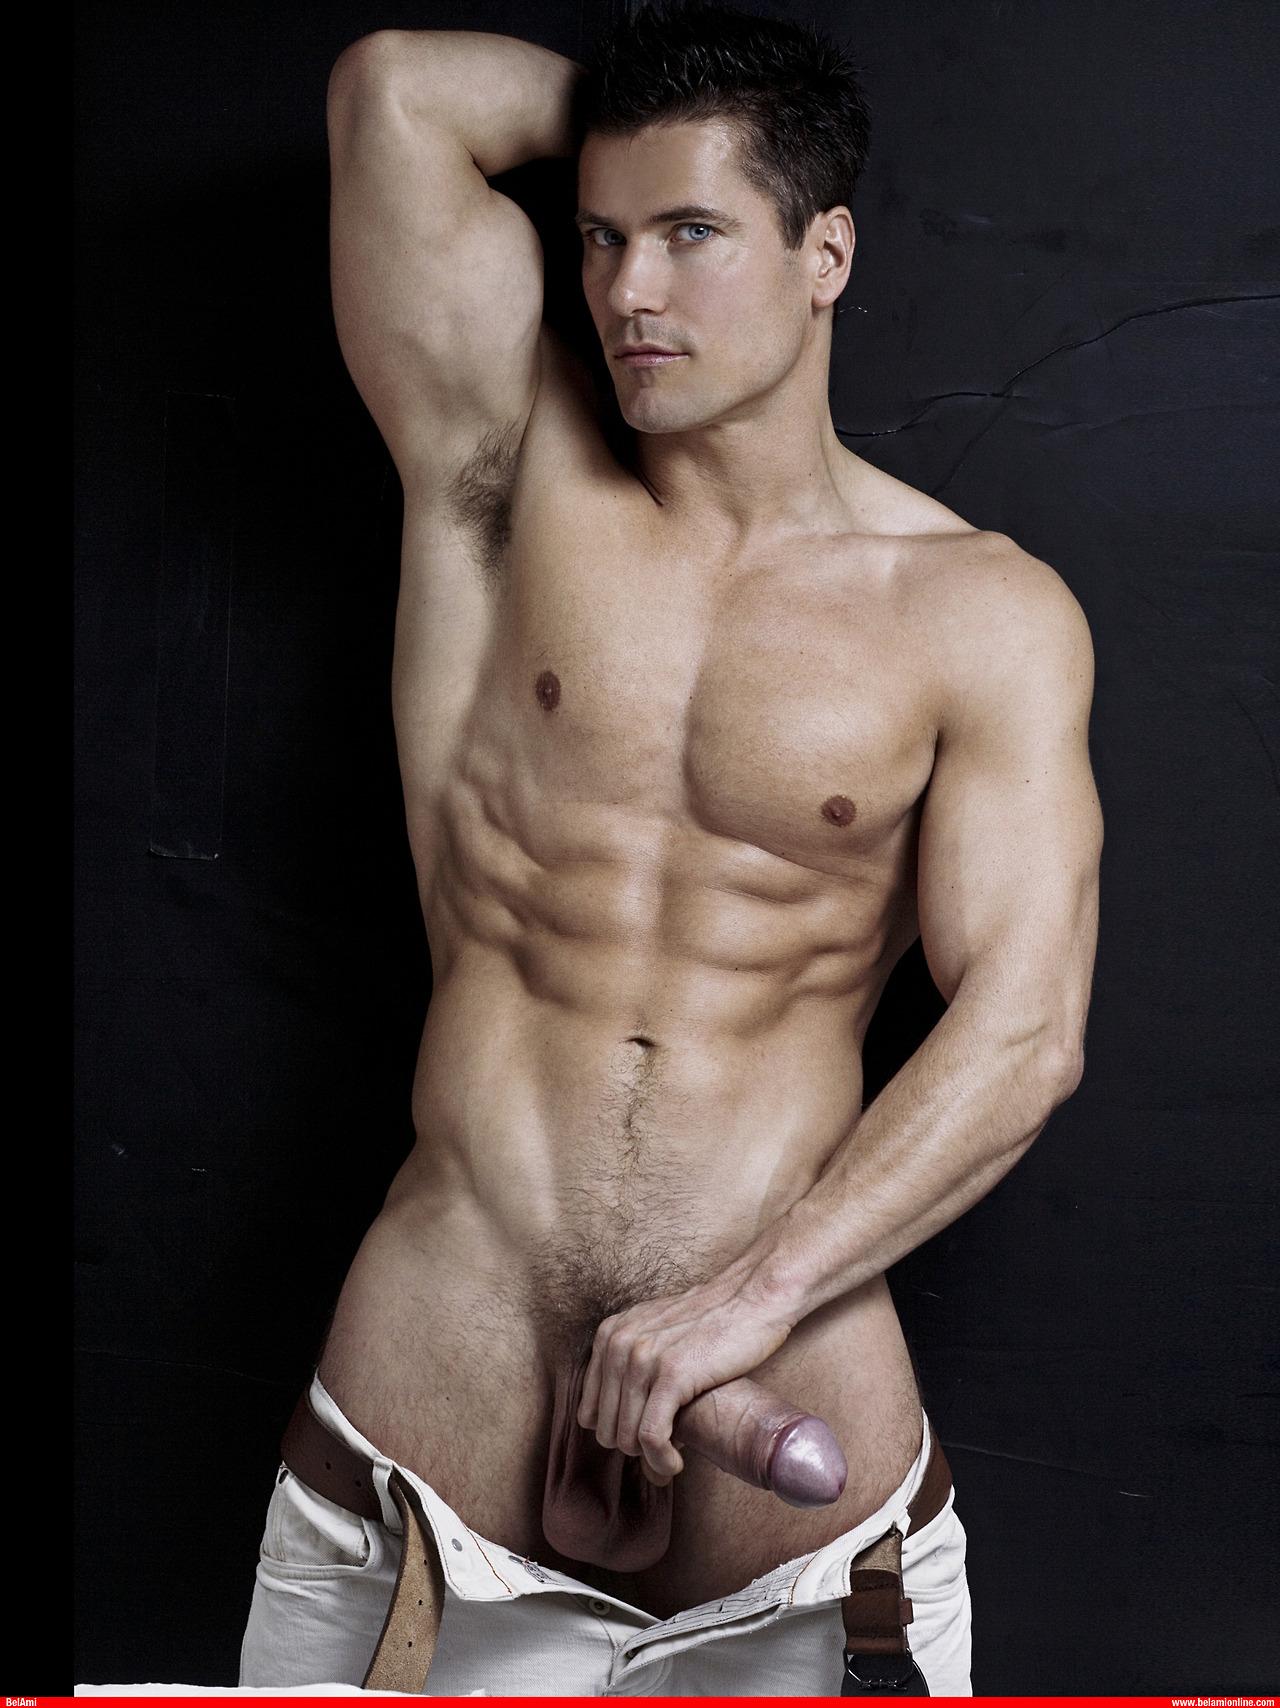 Lukas ridgeston gay porn